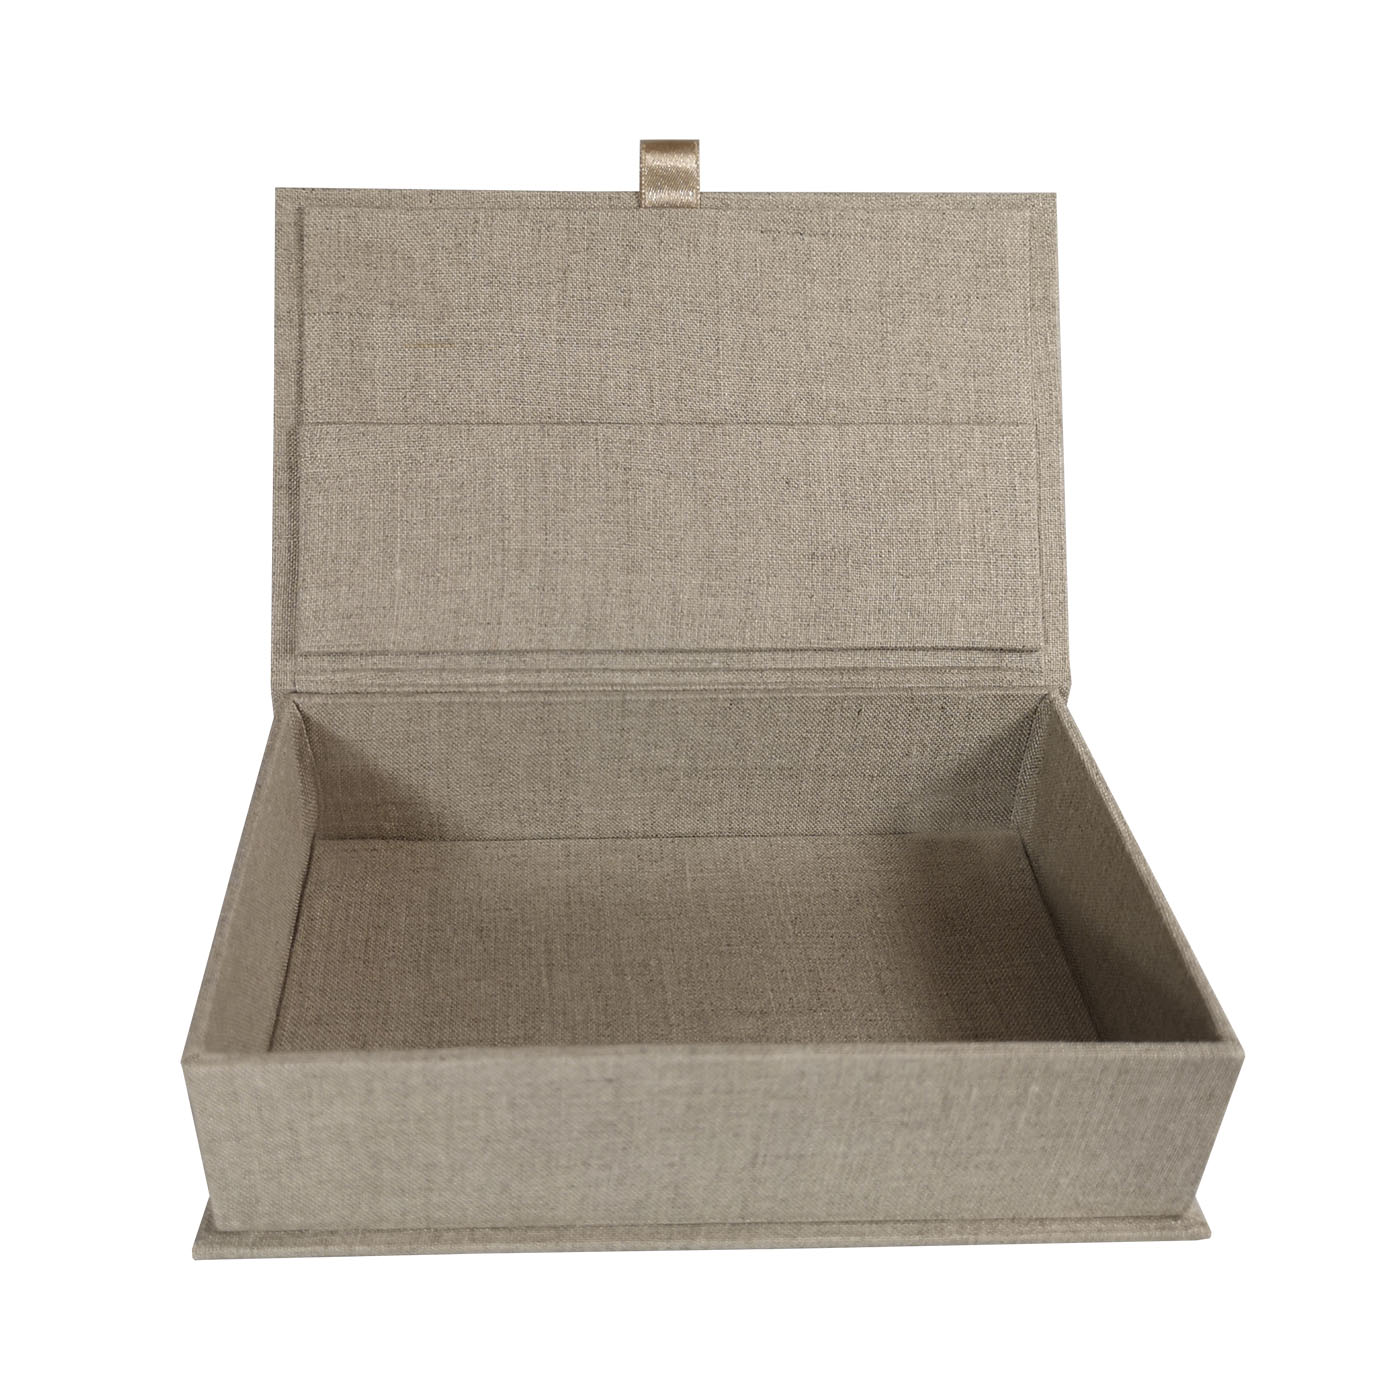 Beige linen box